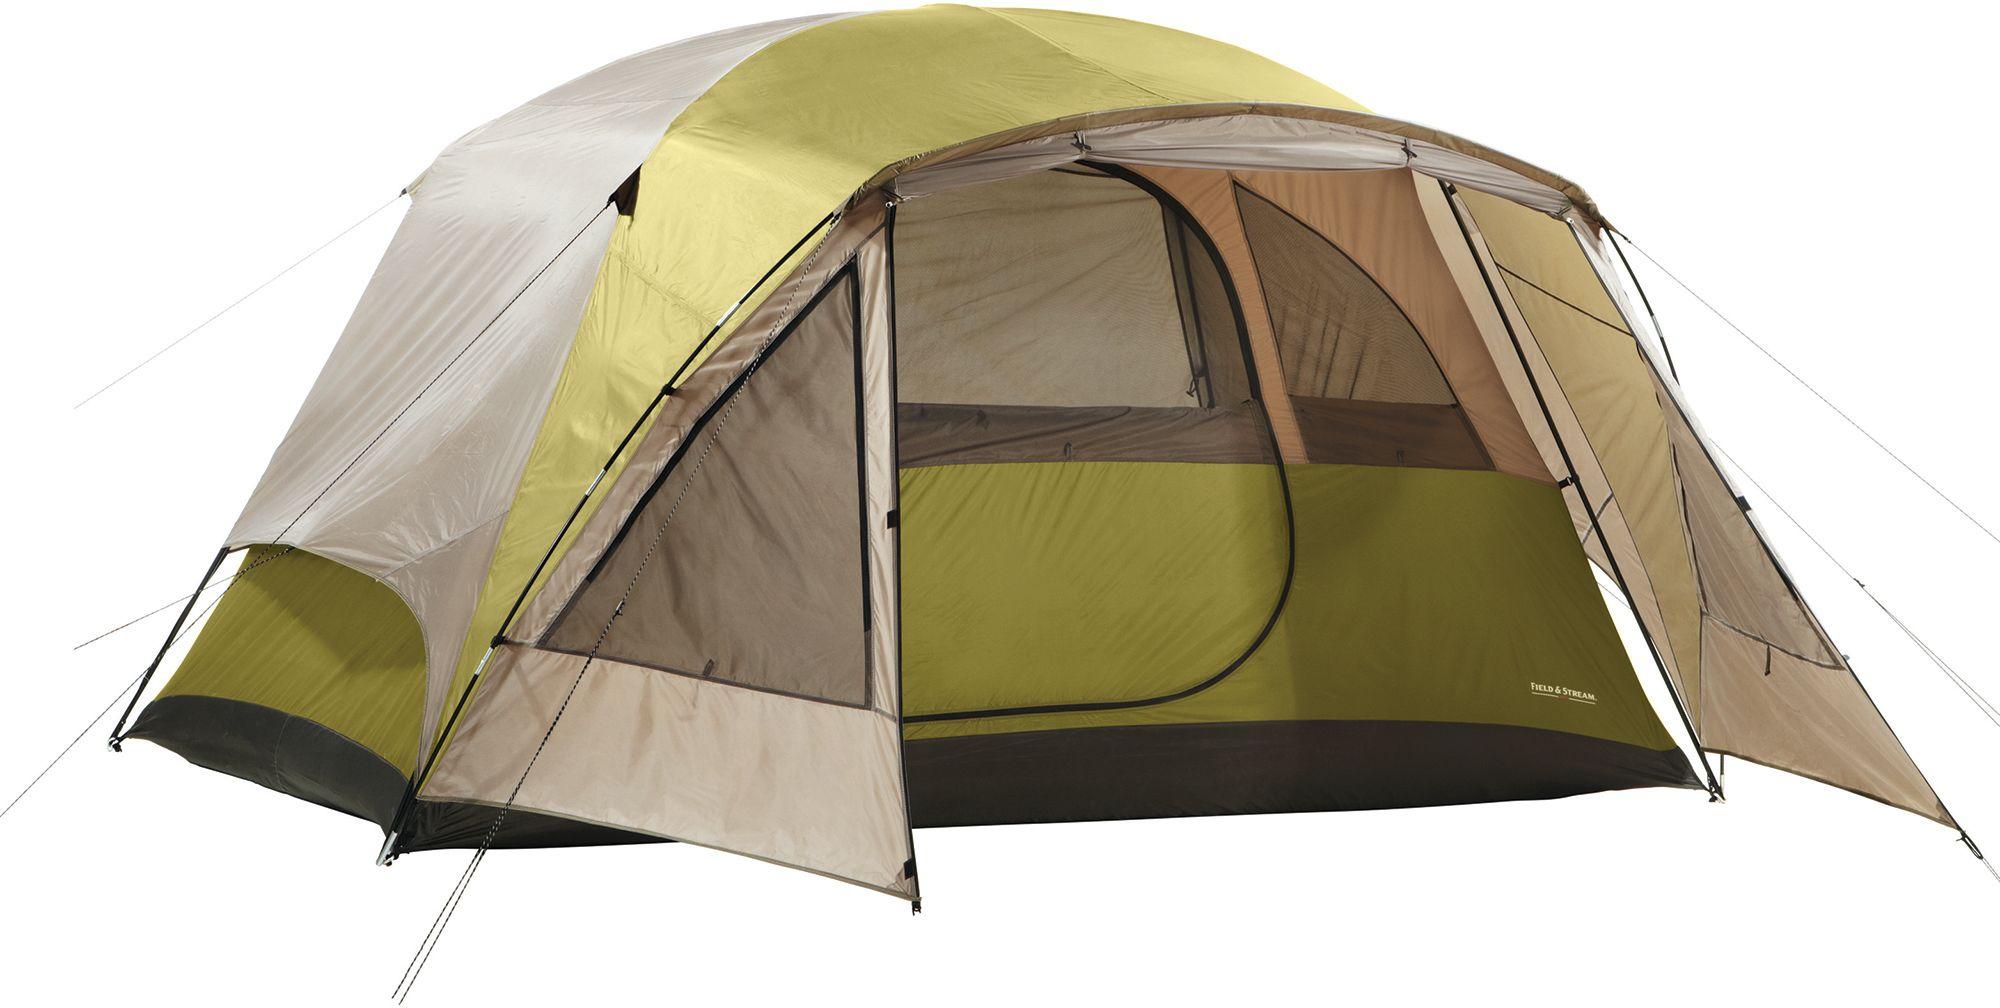 noImageFound ???  sc 1 st  DICKu0027S Sporting Goods & Field u0026 Stream Wilderness Lodge 6 Person Tent | DICKu0027S Sporting Goods